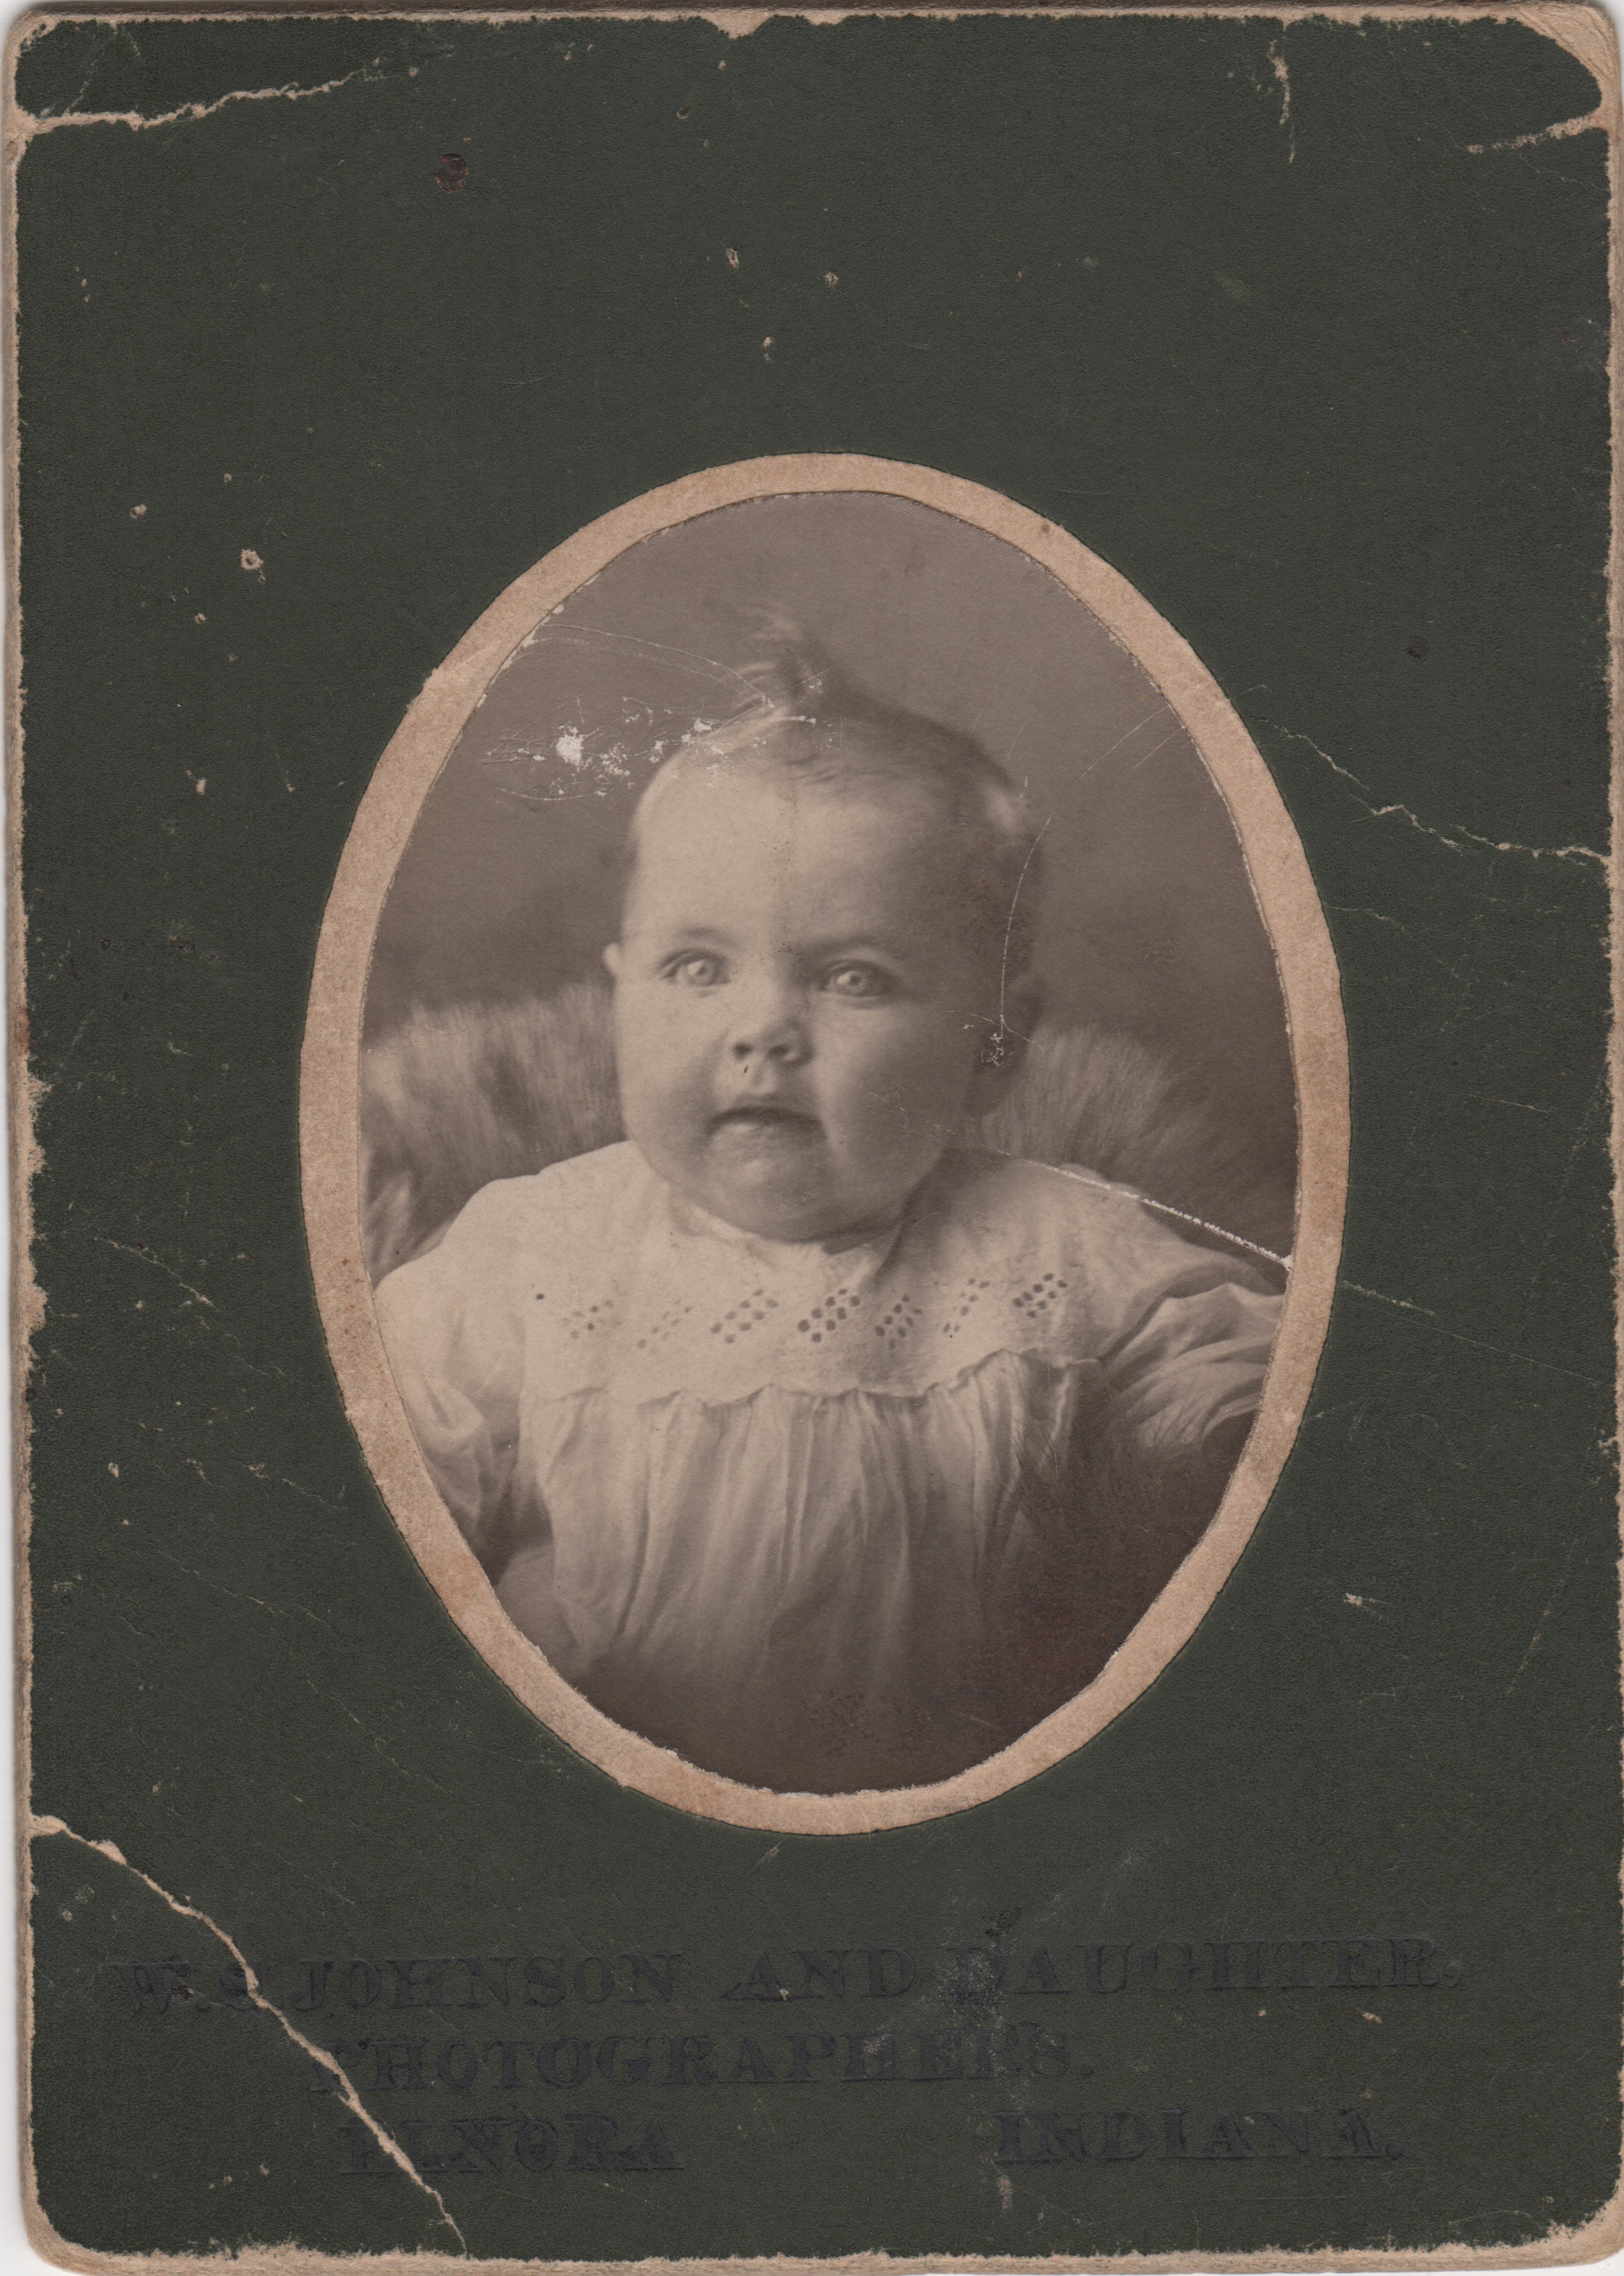 Arthur Sears baby.jpeg